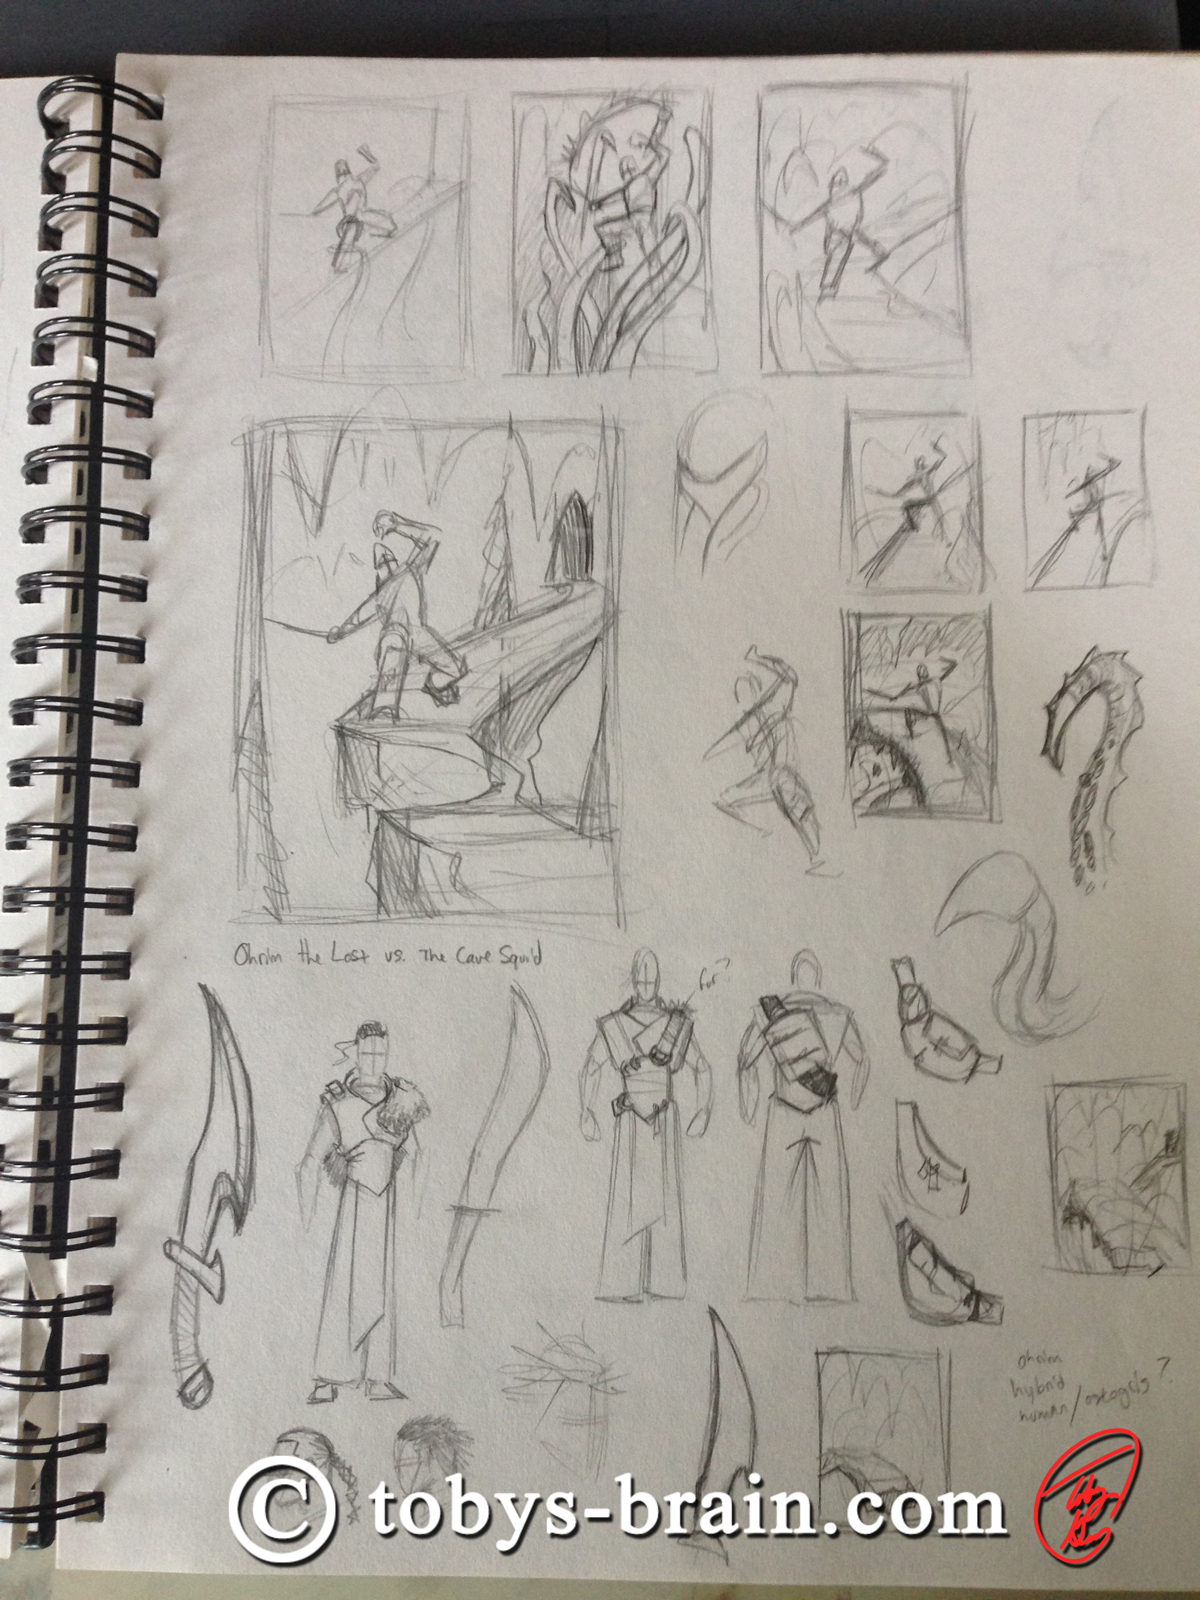 Toby-Gray-ohrim-vs-cave-squid-sketch-1